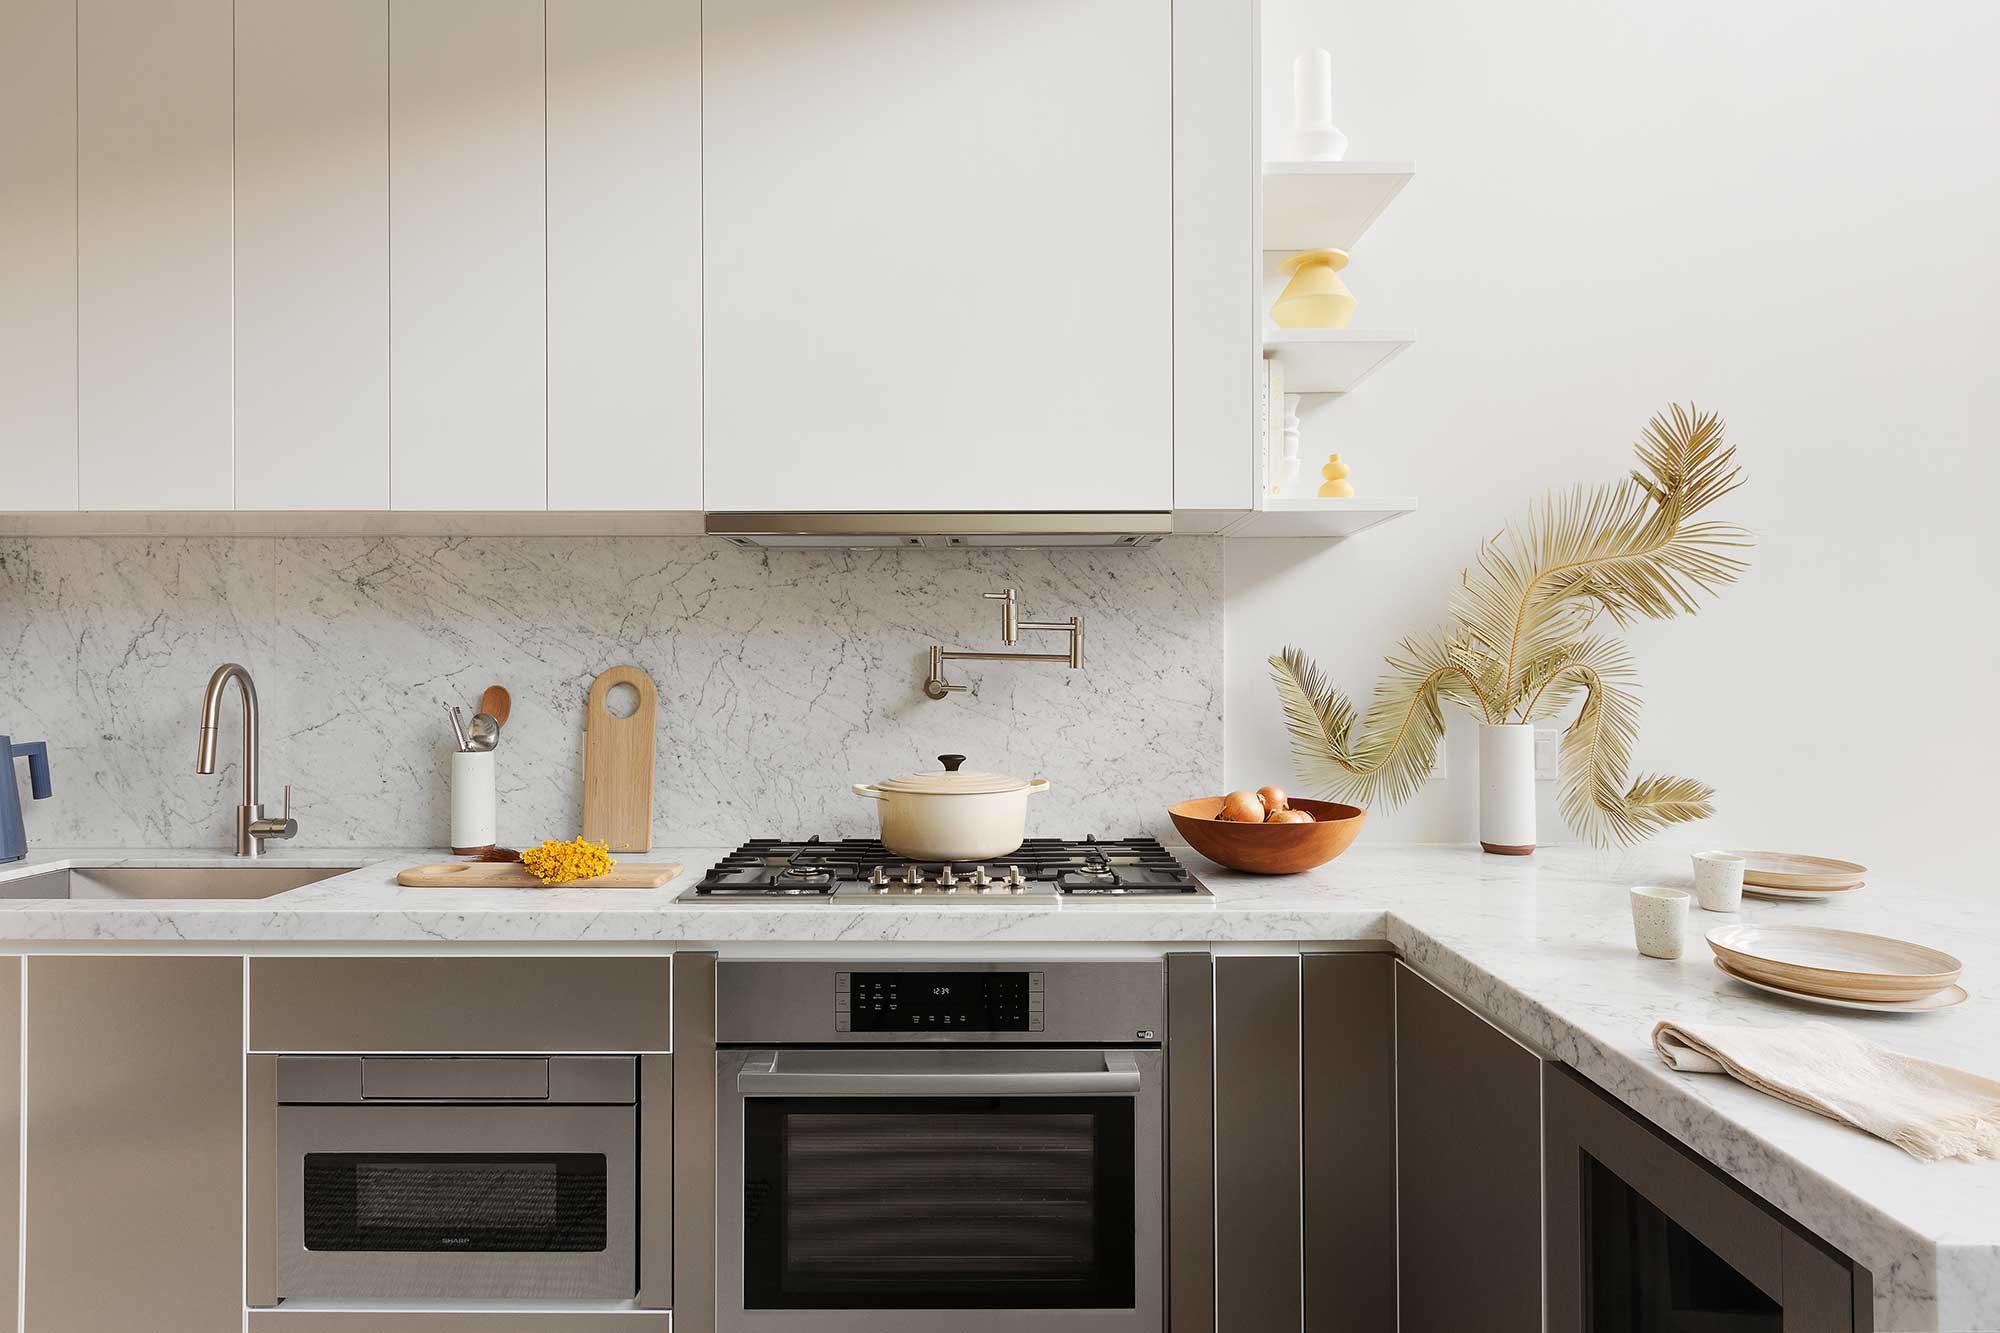 Custom White and Metallic Duo Tone KitchensThe Bath Haus Interior Design by Meshberg Group